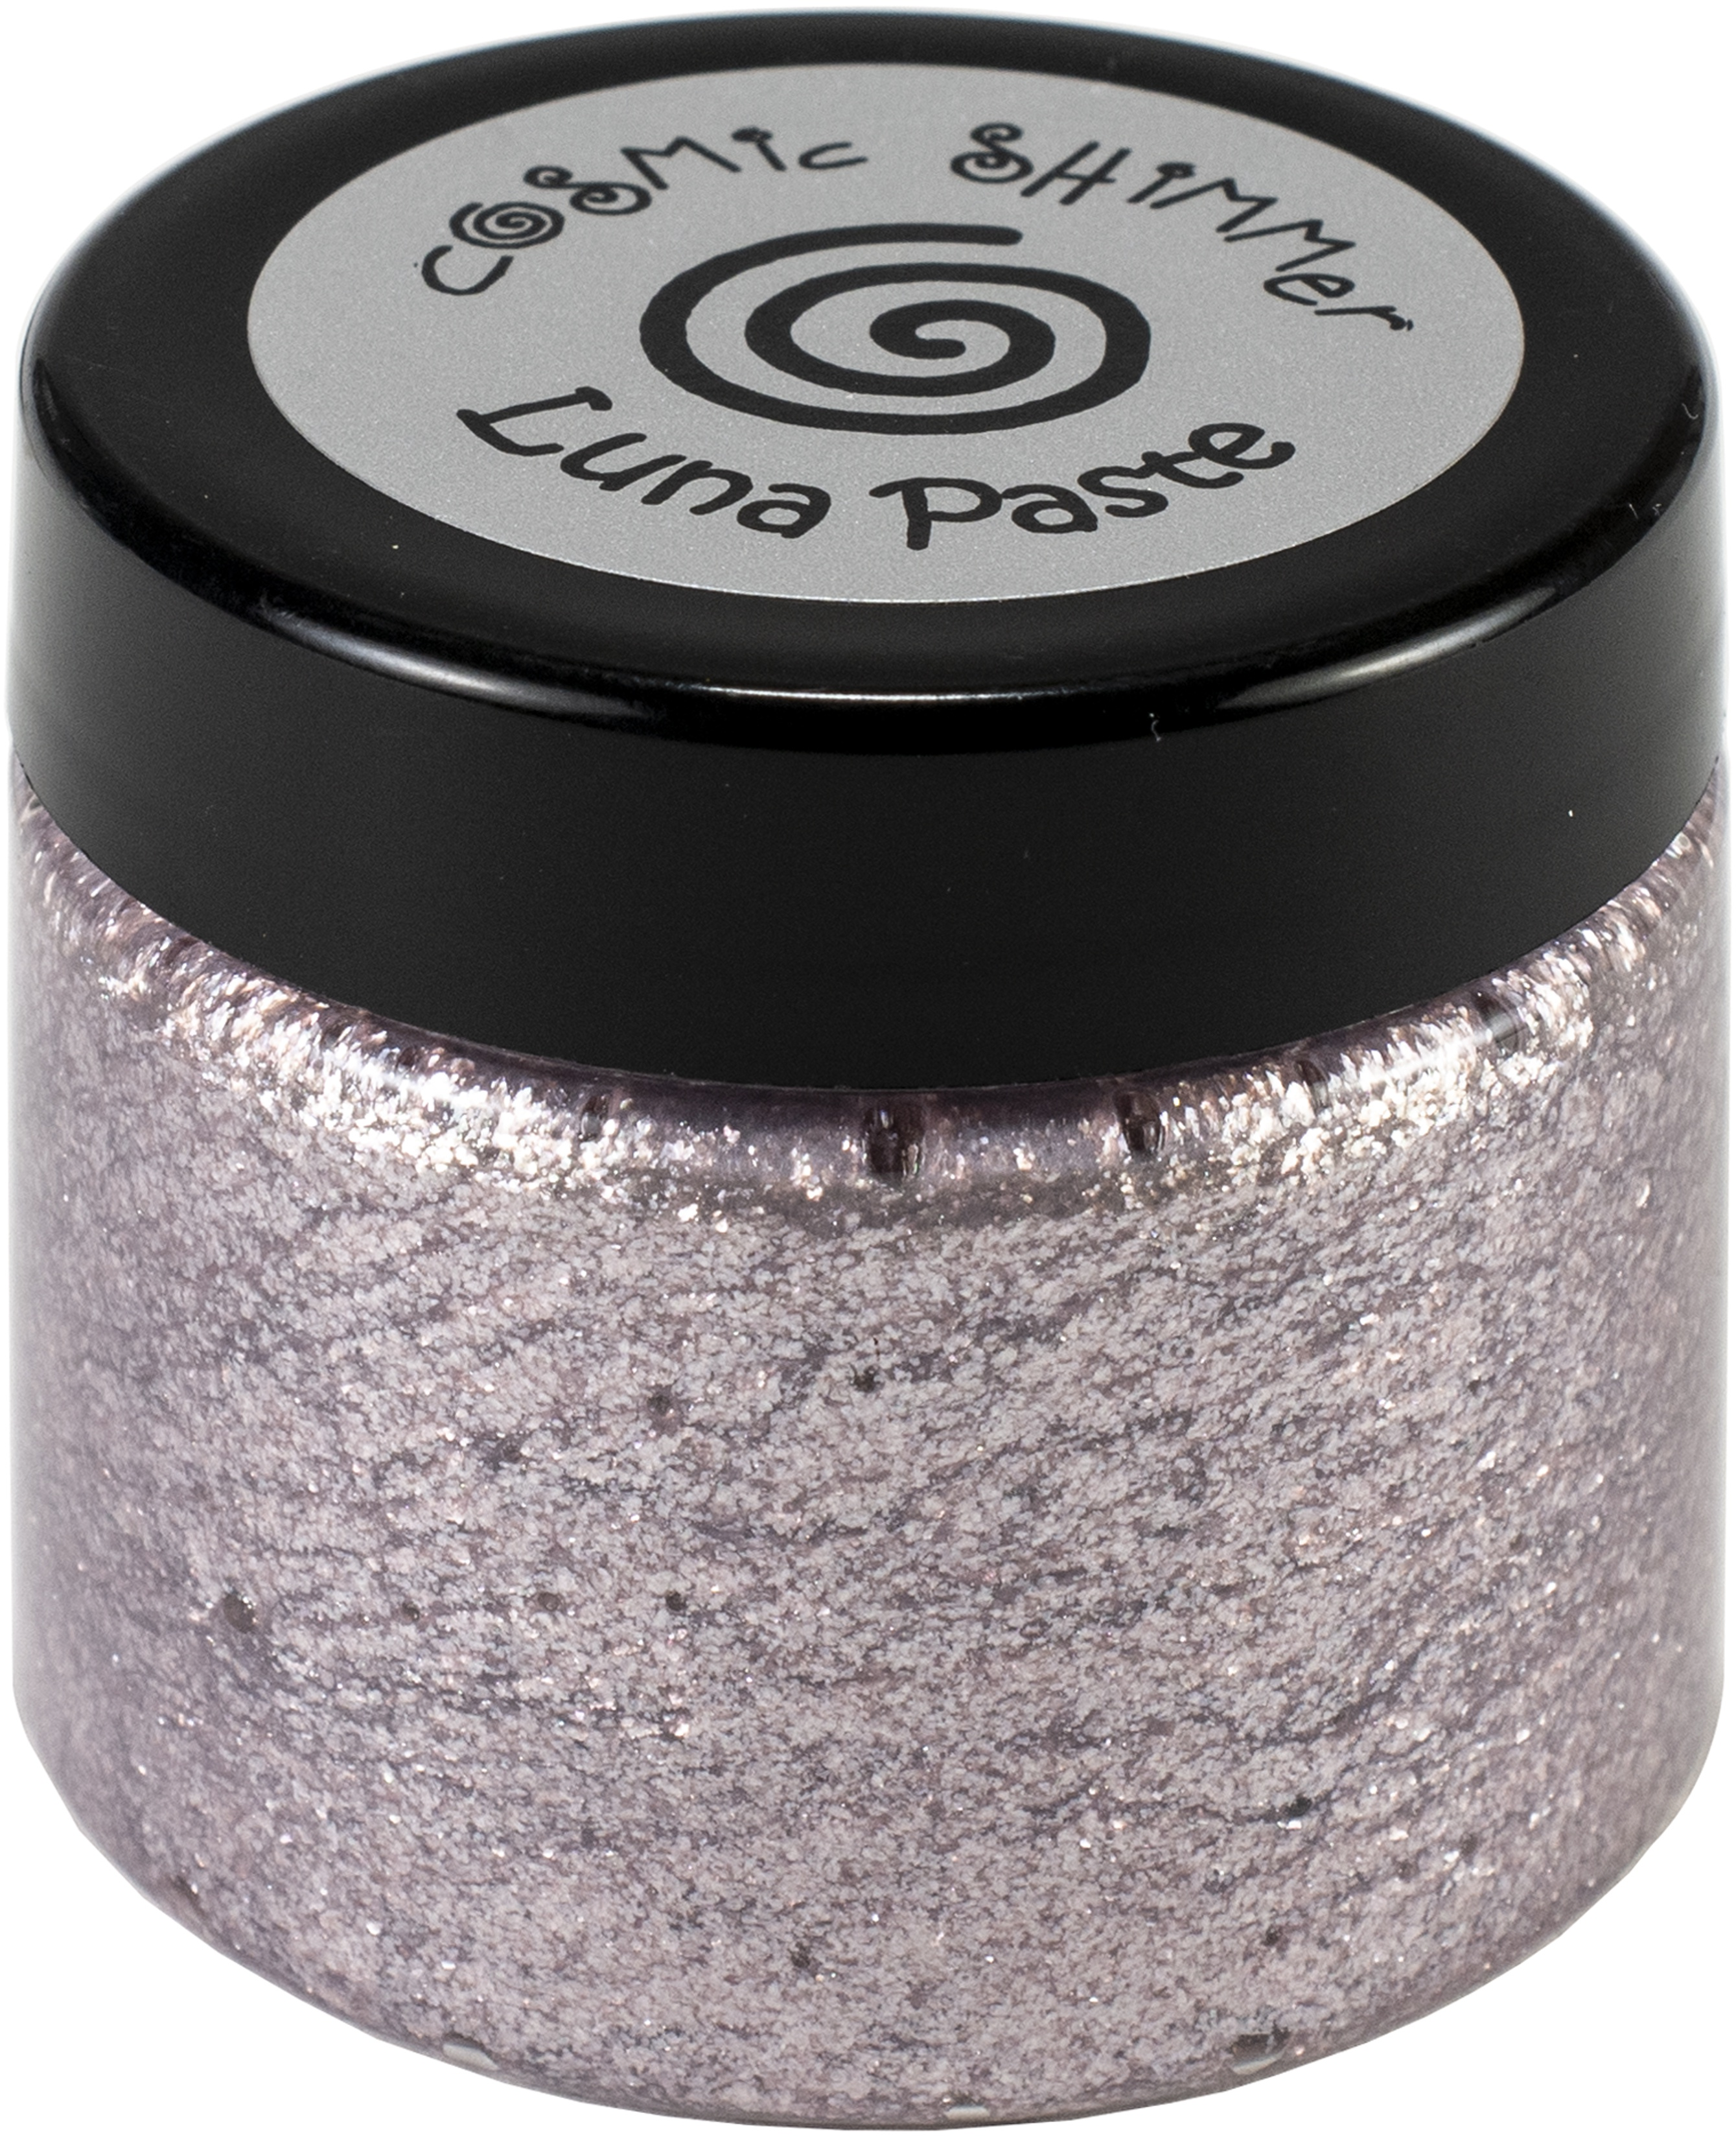 Cosmic Shimmer Luna Paste-Moonlight Pink